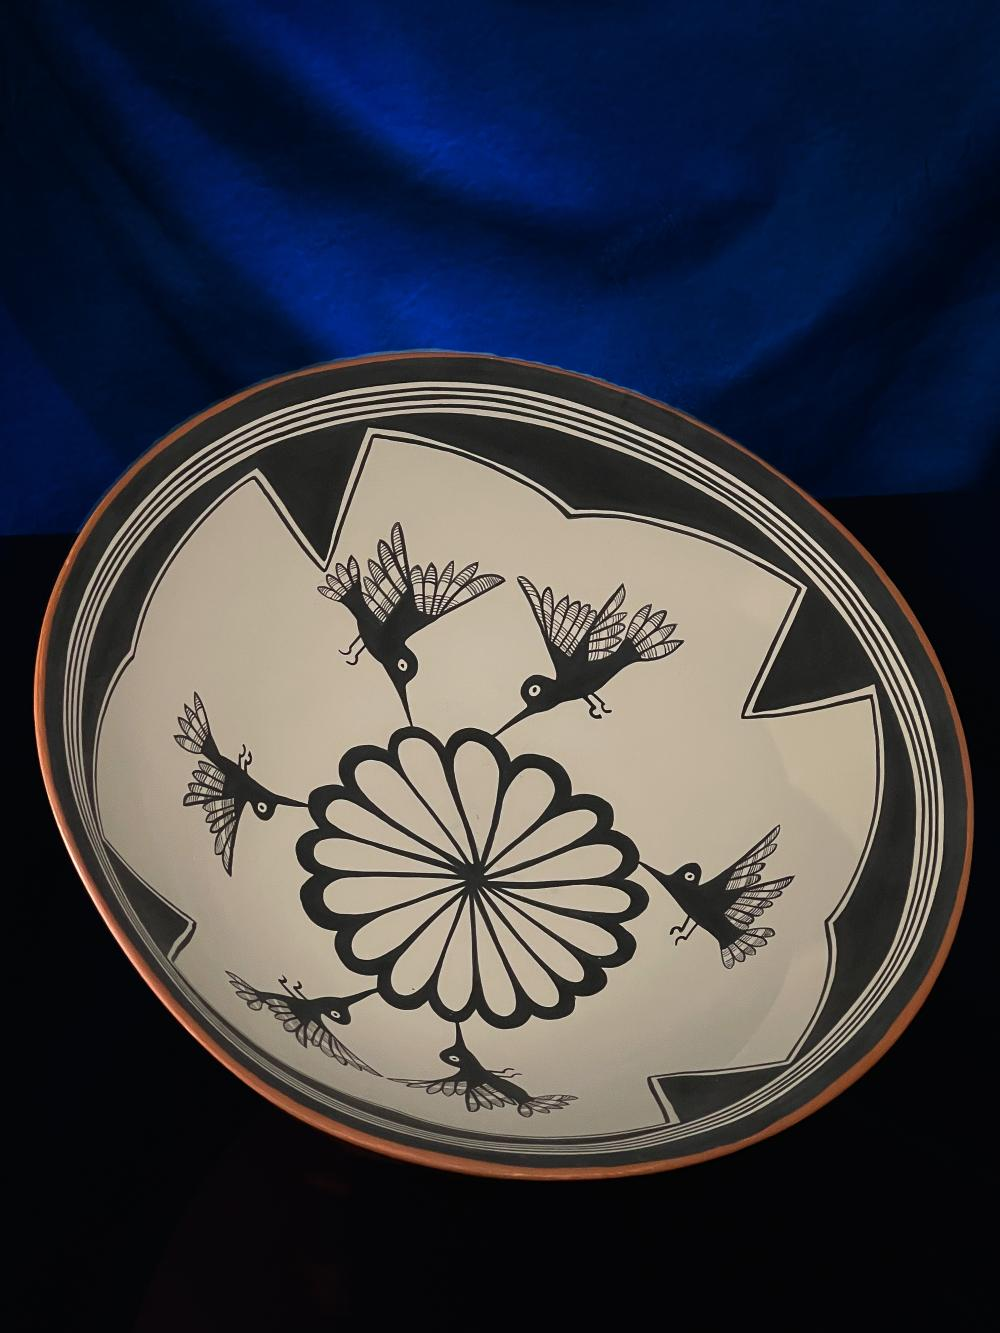 Verda Toledo Jemez Pottery Pueblo dough bowl by VJT Hummingbird Pot V.J.T.